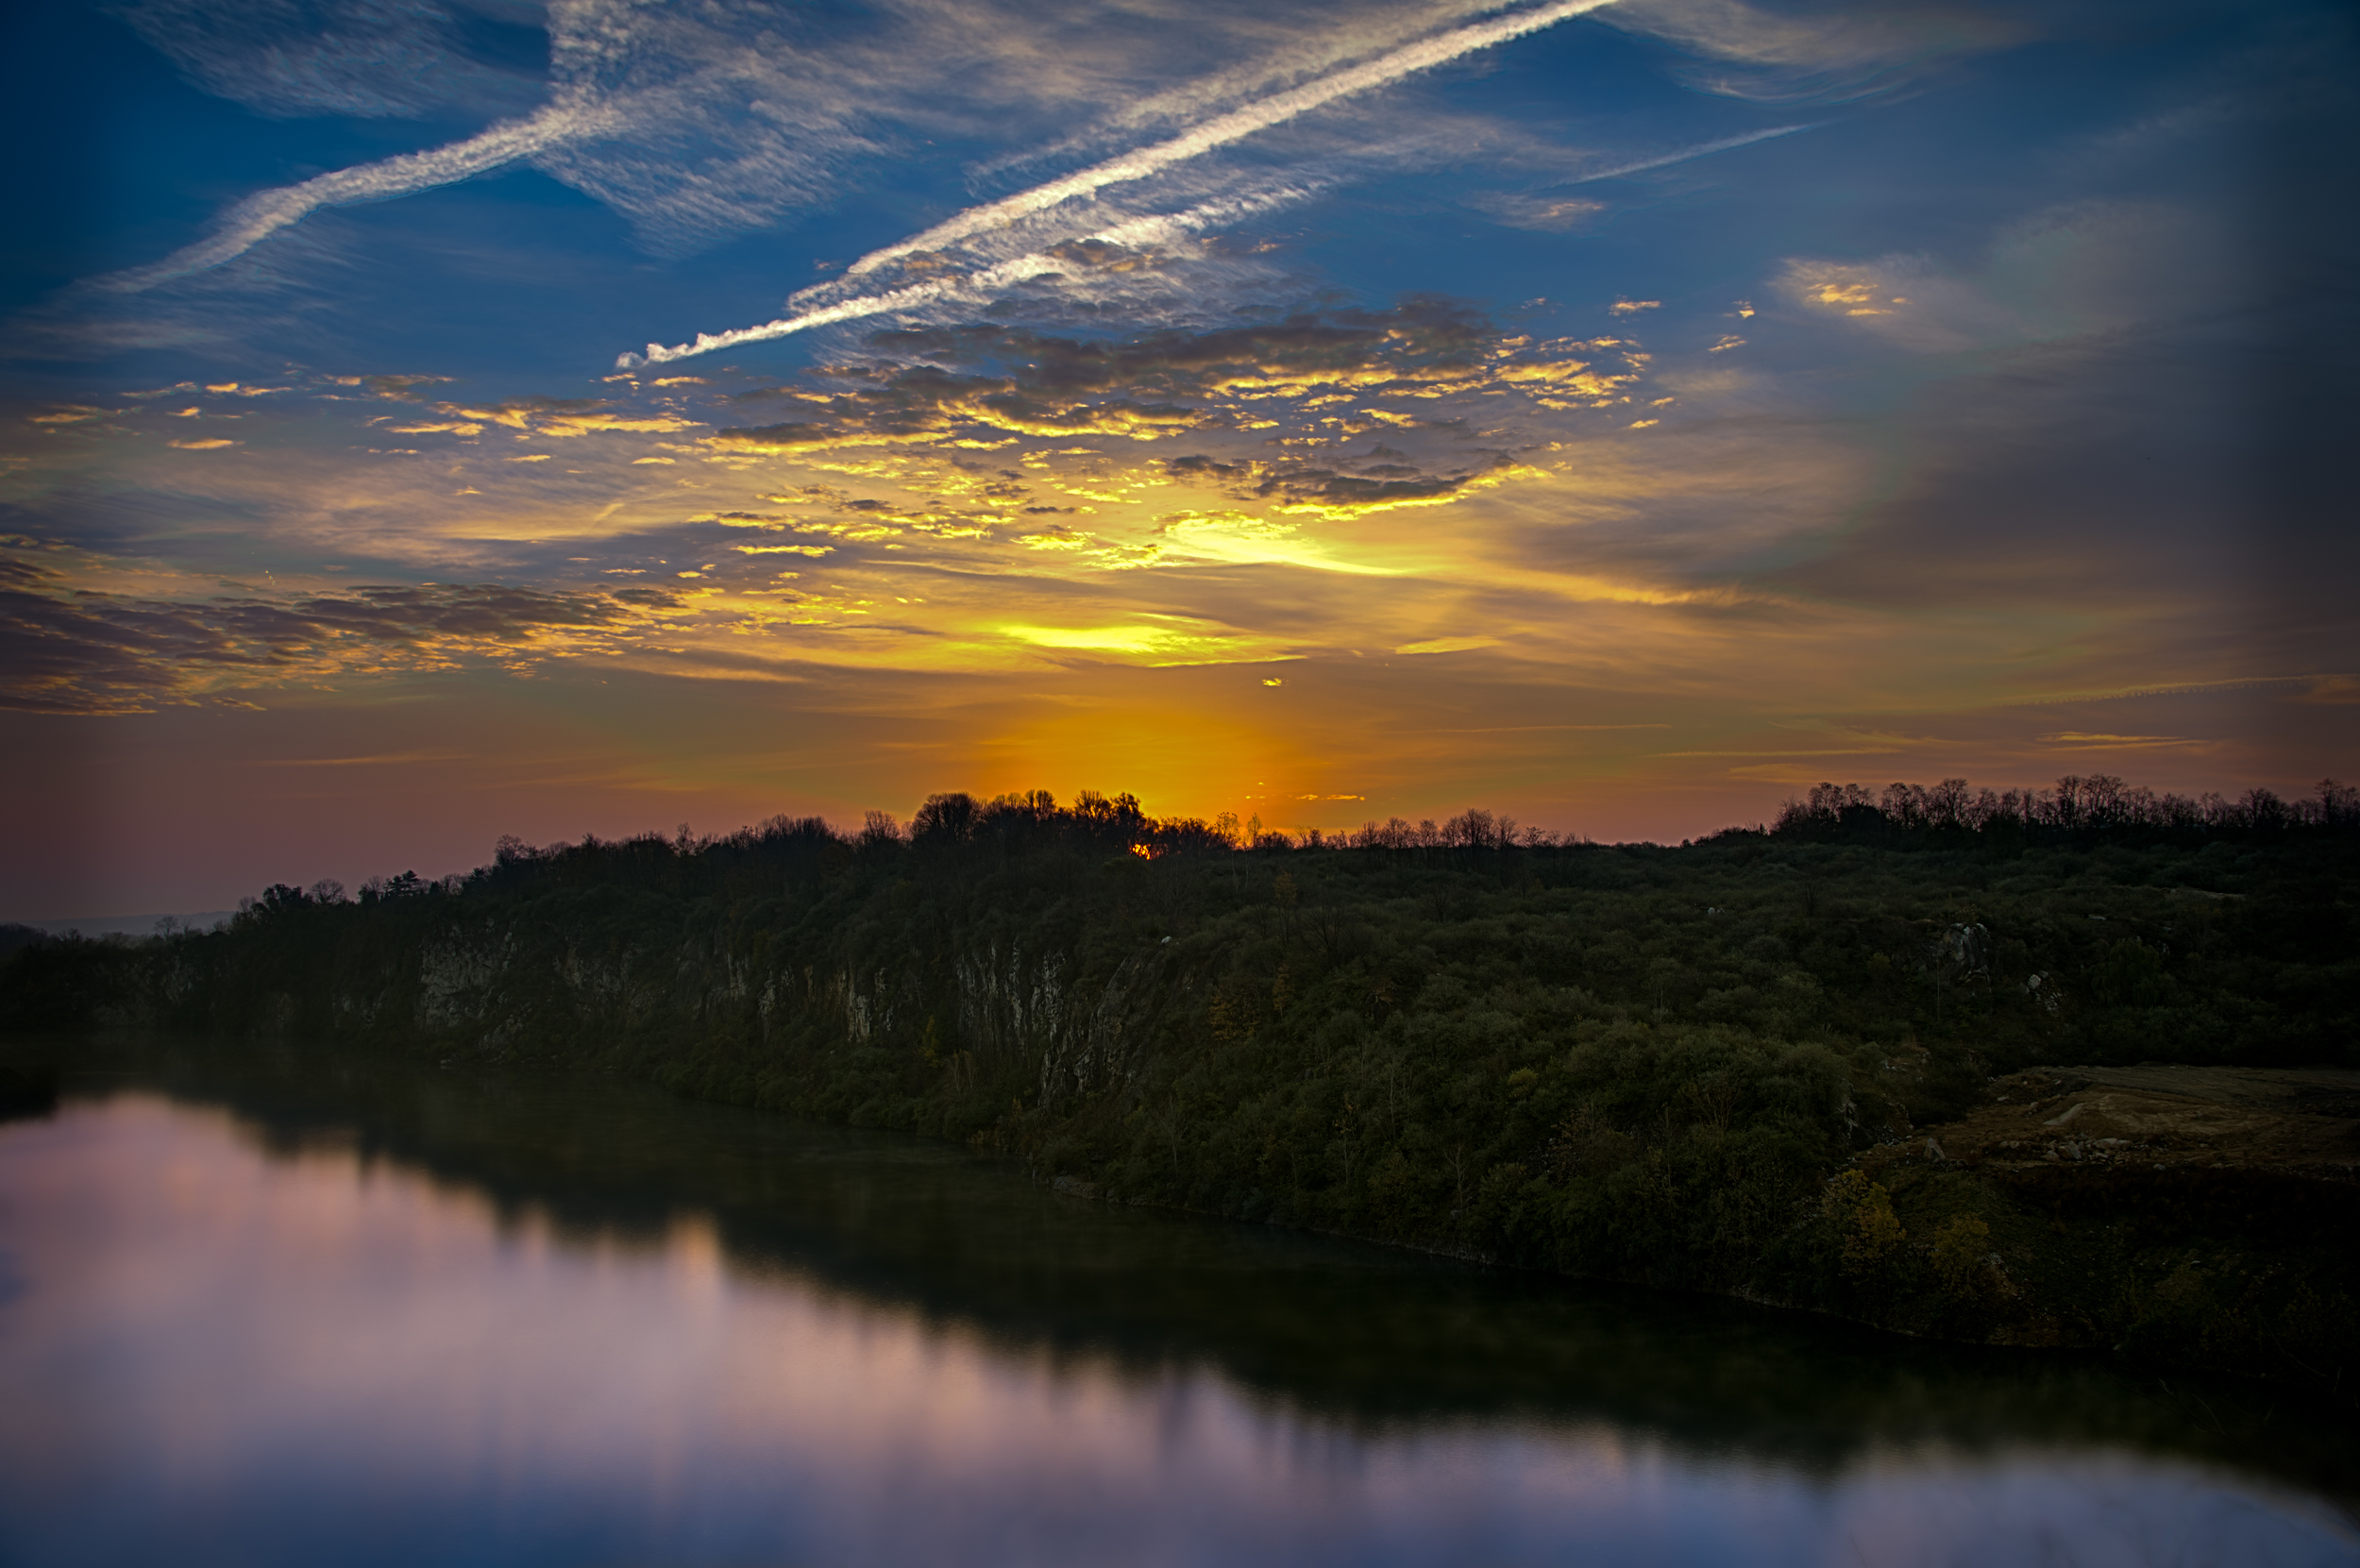 Sunrise at the Quarry